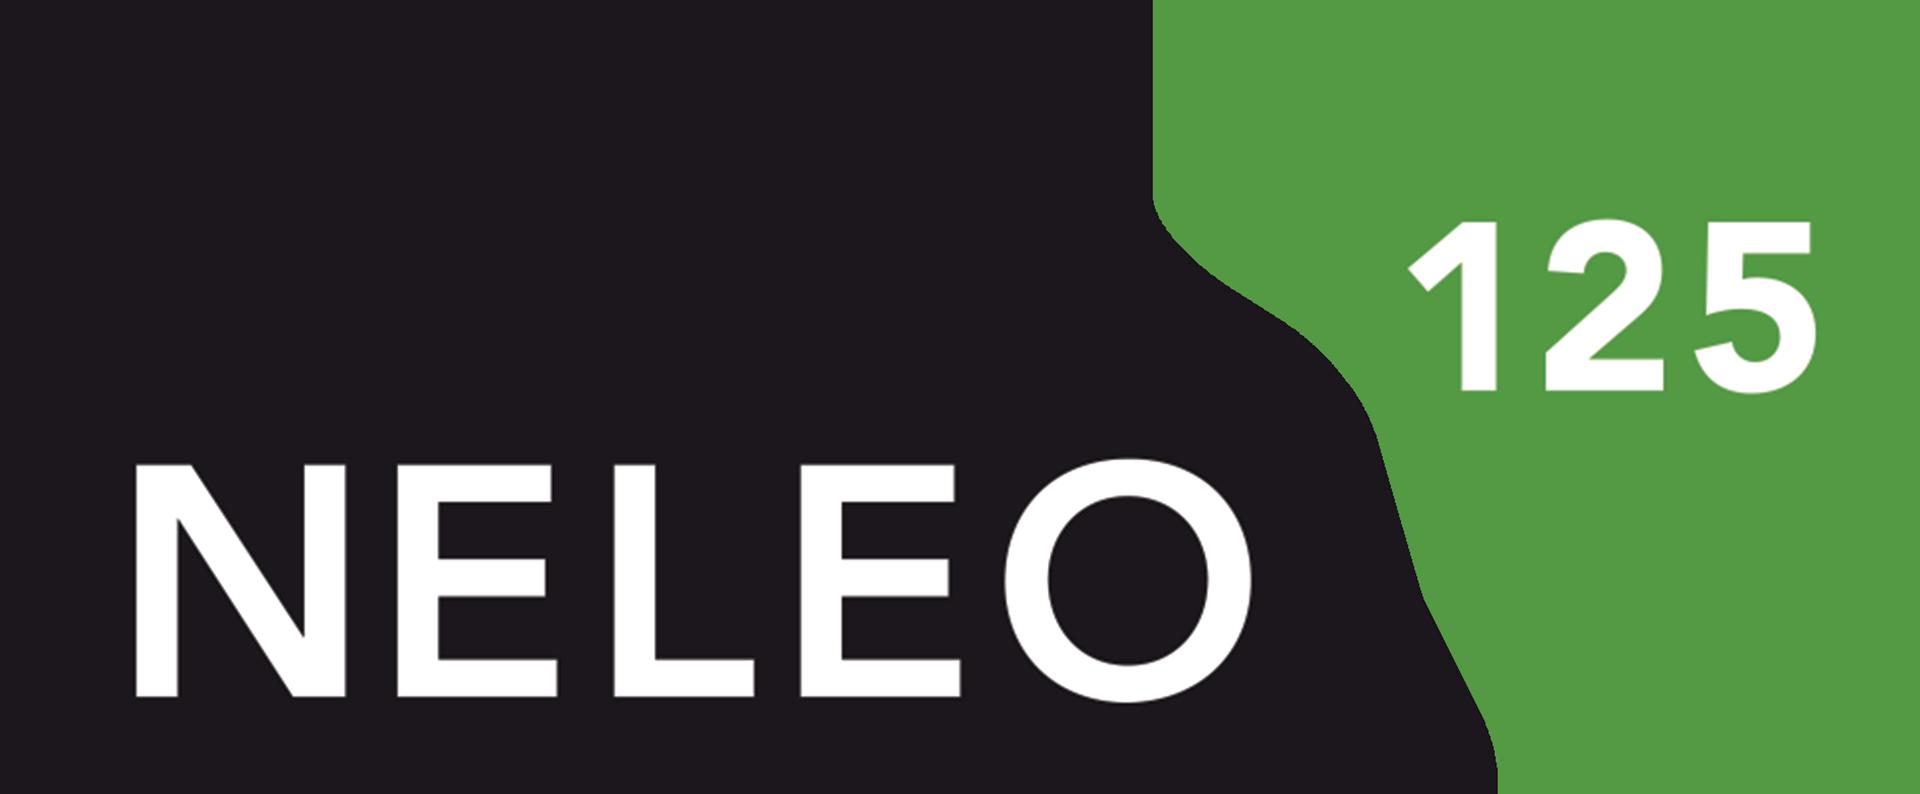 Neleo 125 Logo